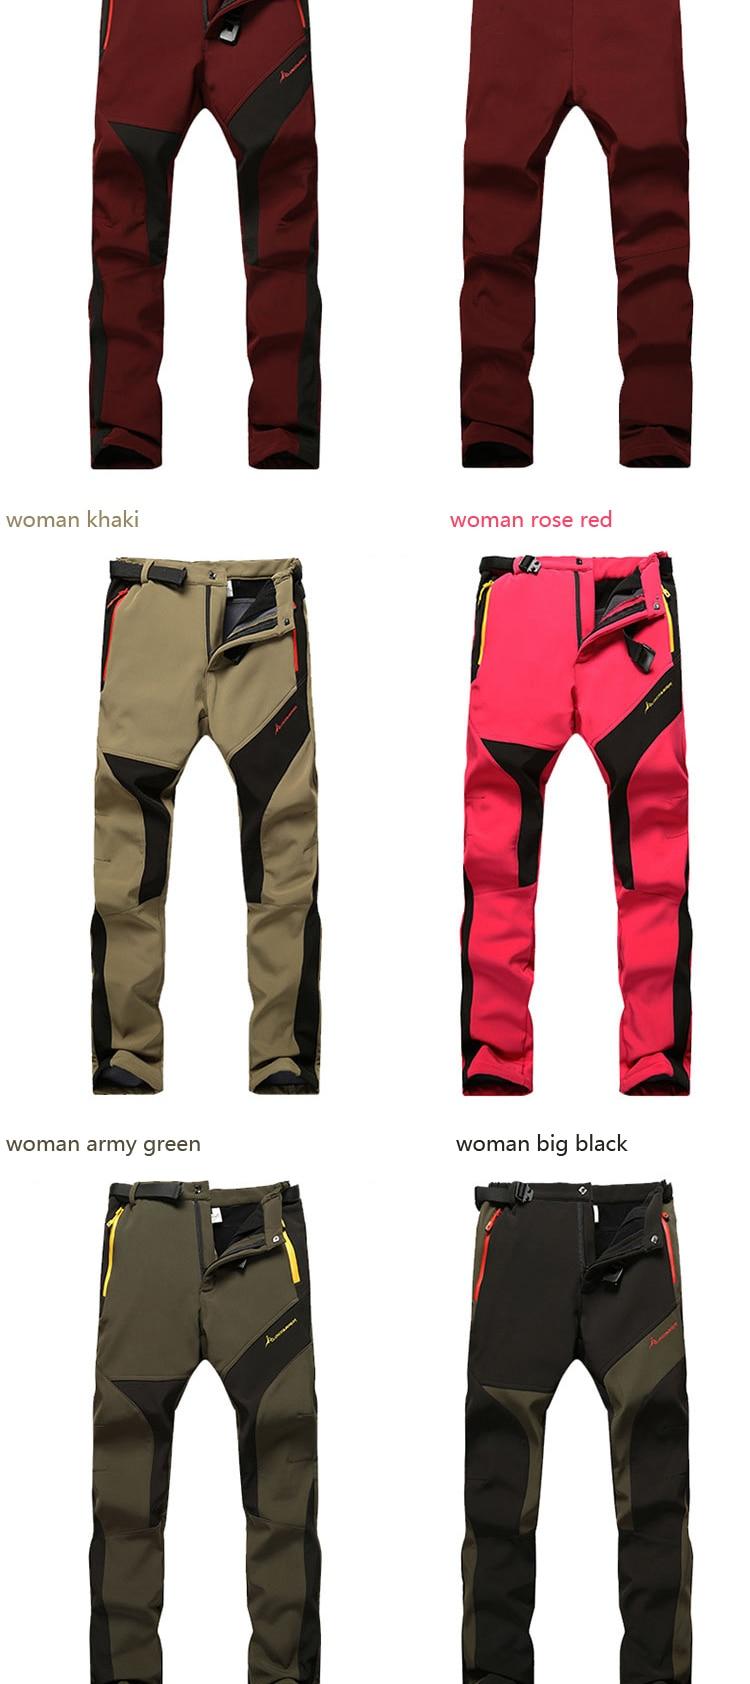 men women pants (8)